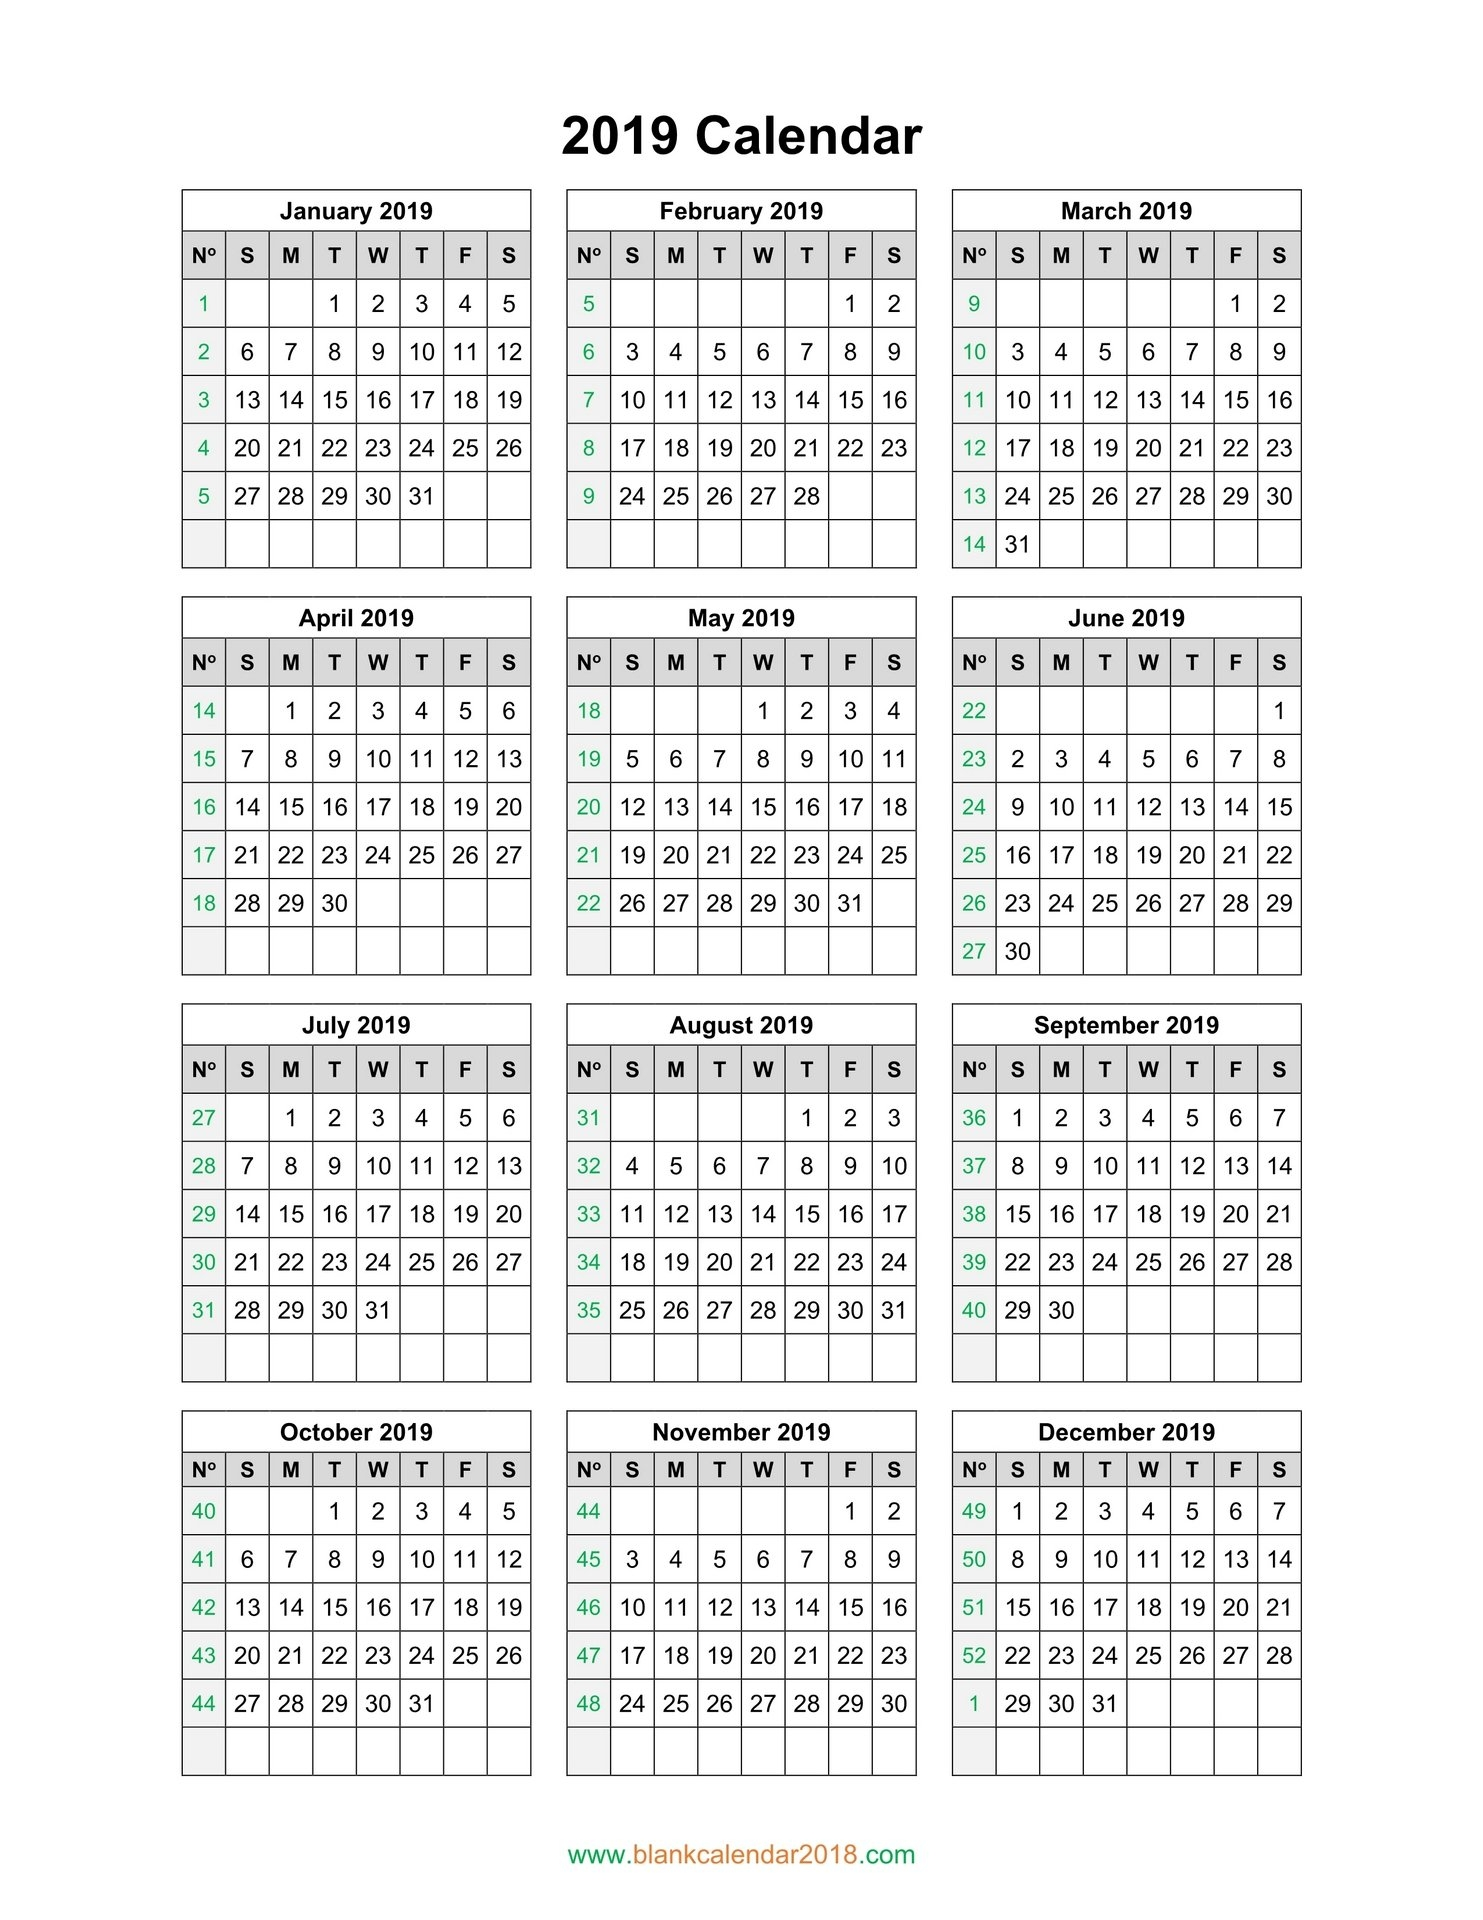 Blank Calendar 2019 1 Page Yearly Calendar 2019